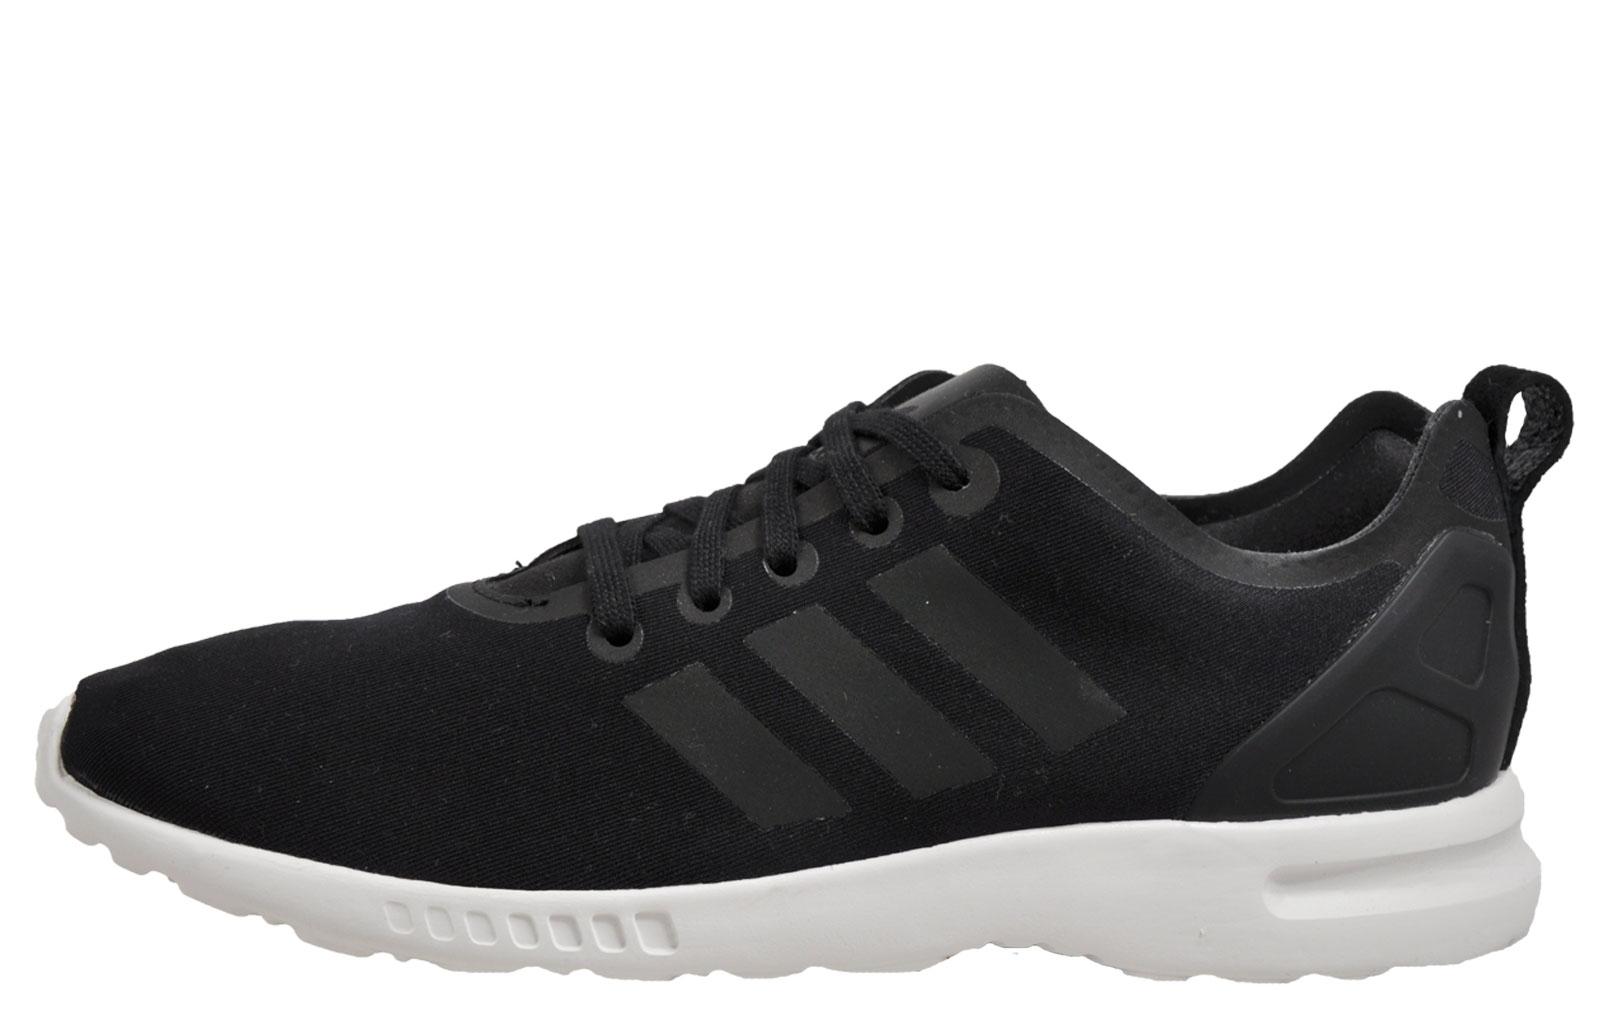 men's adidas black zx flux adv asym primeknit nz